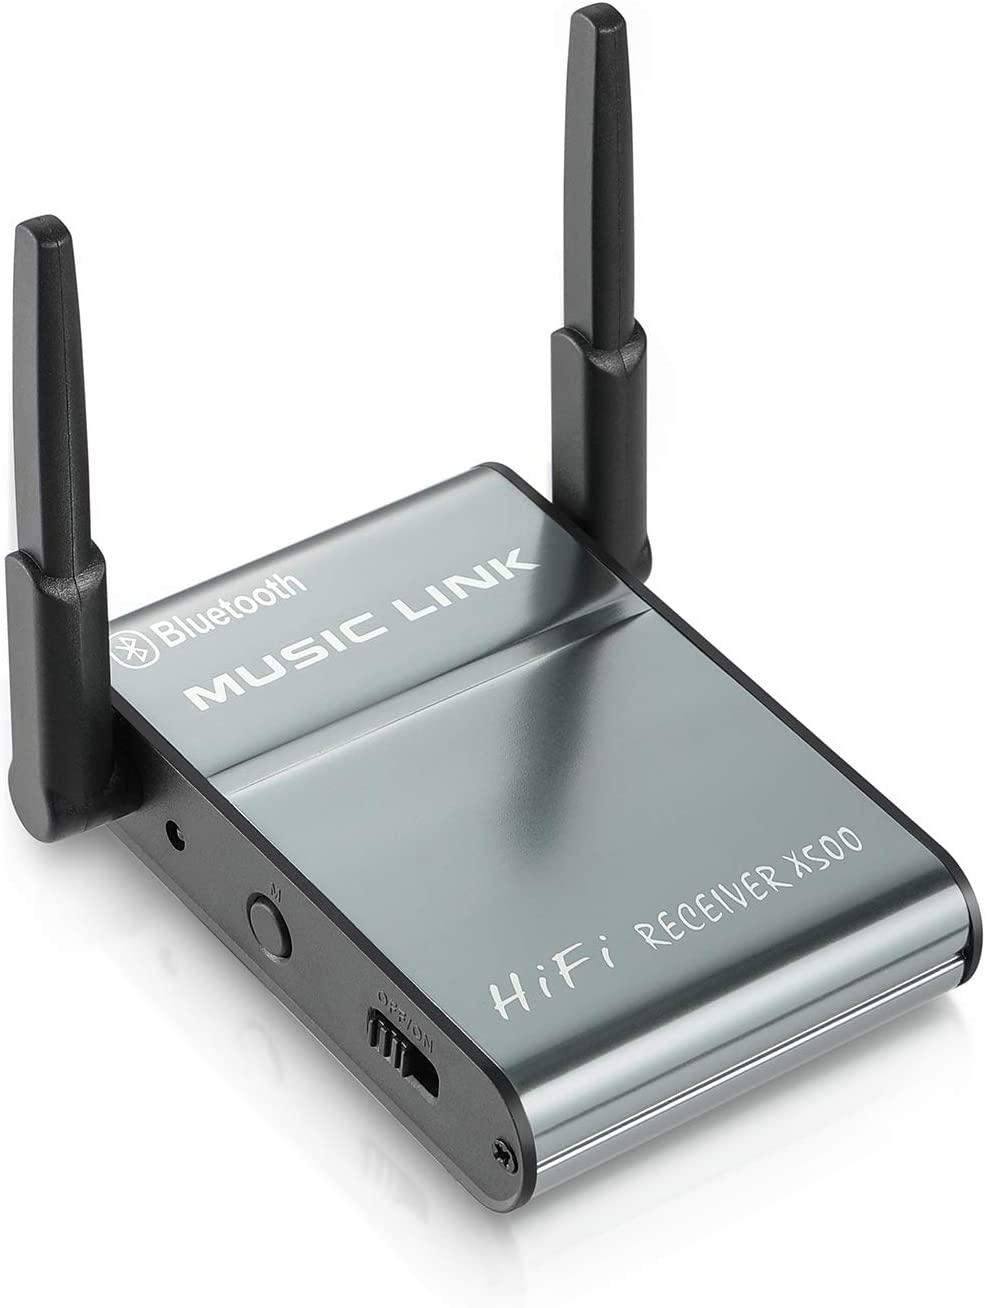 [2020 New] Carrep Bluetooth Receiver HiFi Wireless Audio Adapter, Bluetooth 5.0 3D Surround Amplifier Antenna, aptX Low Latency